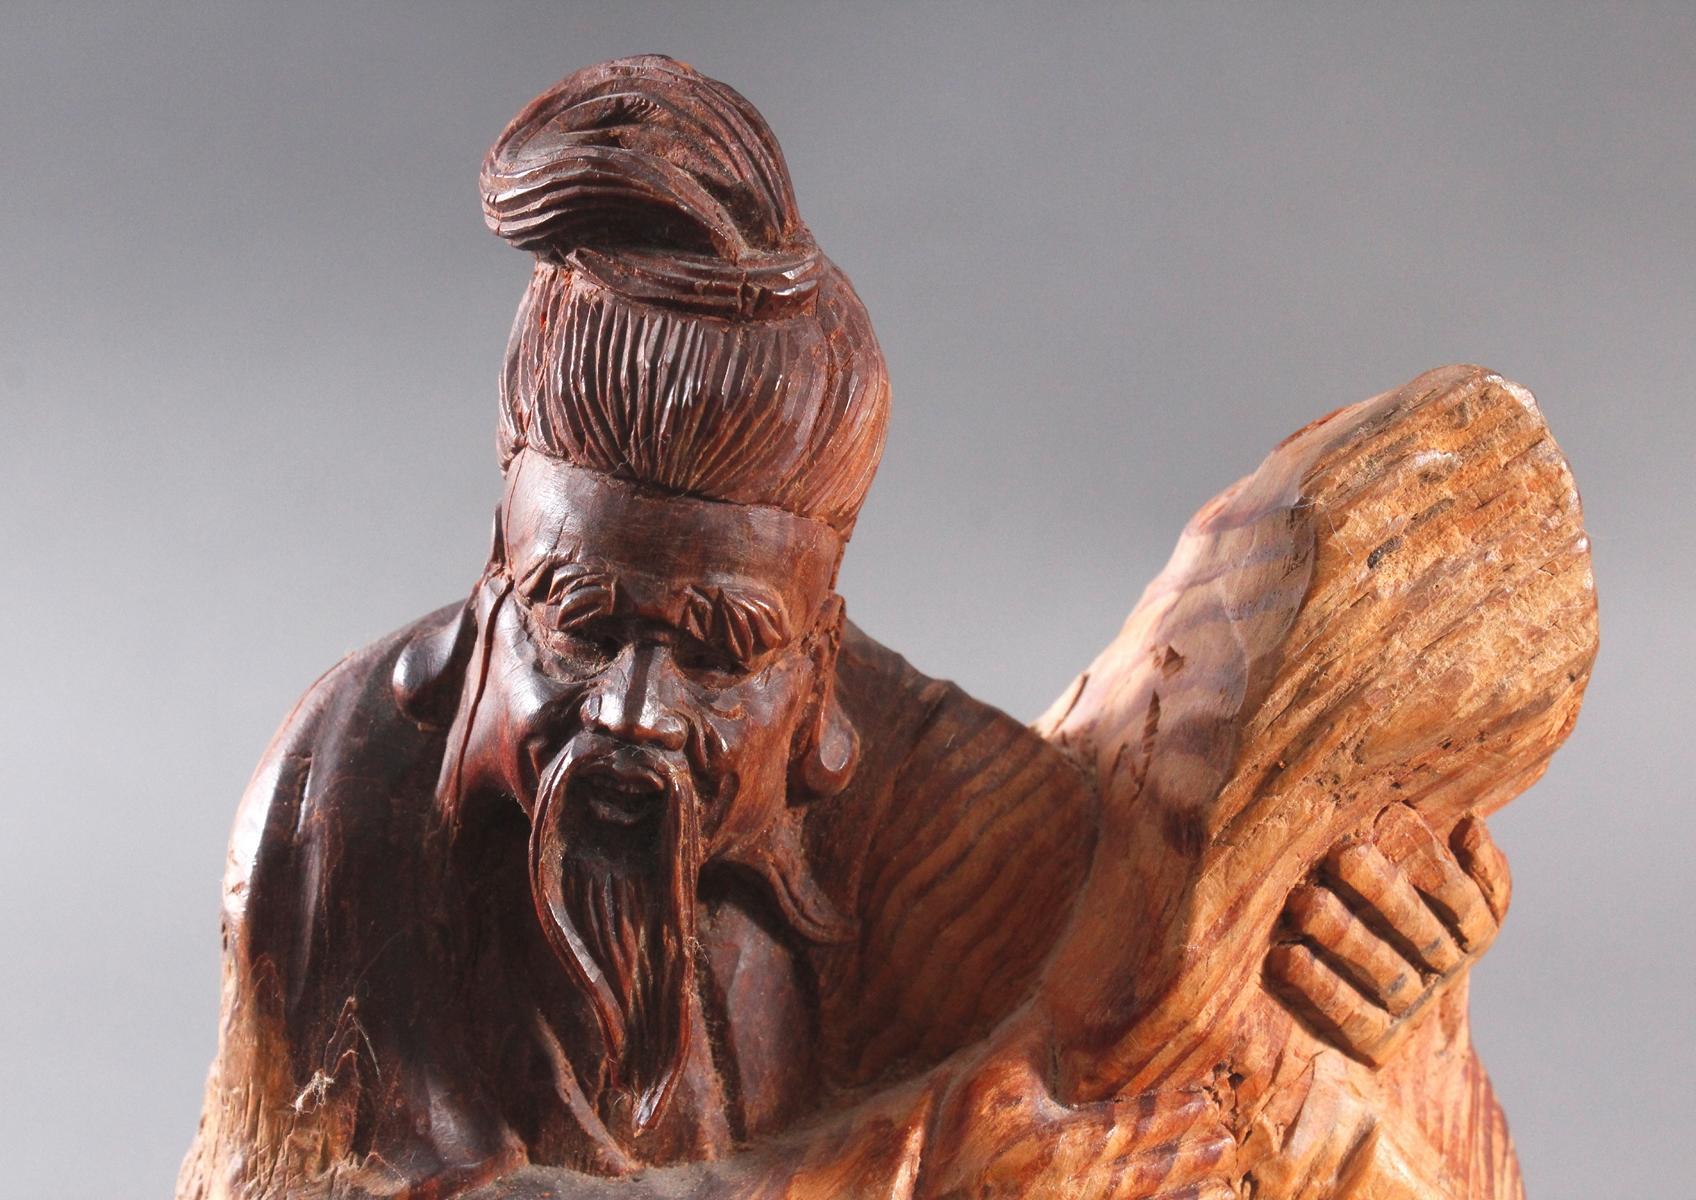 Holzskulptur, China 2. Hälfte 20. Jh. Mann mit Bart-5